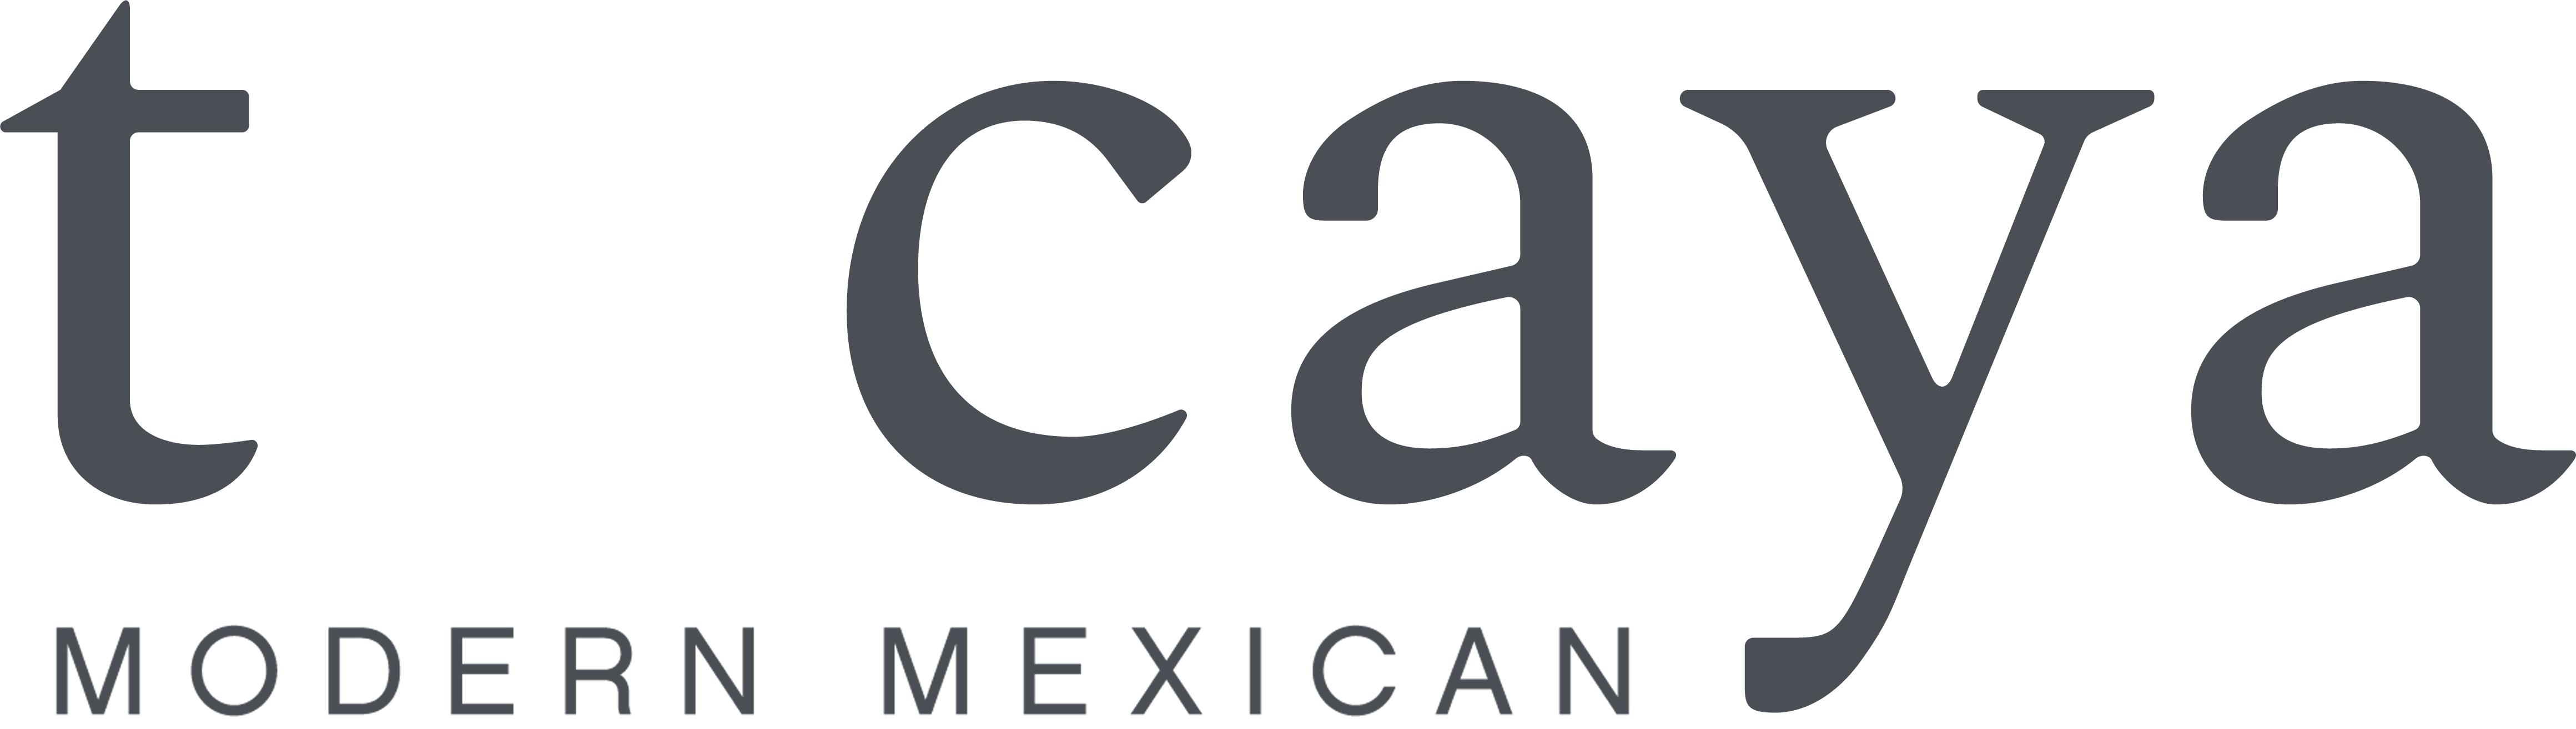 Tocaya organica logo